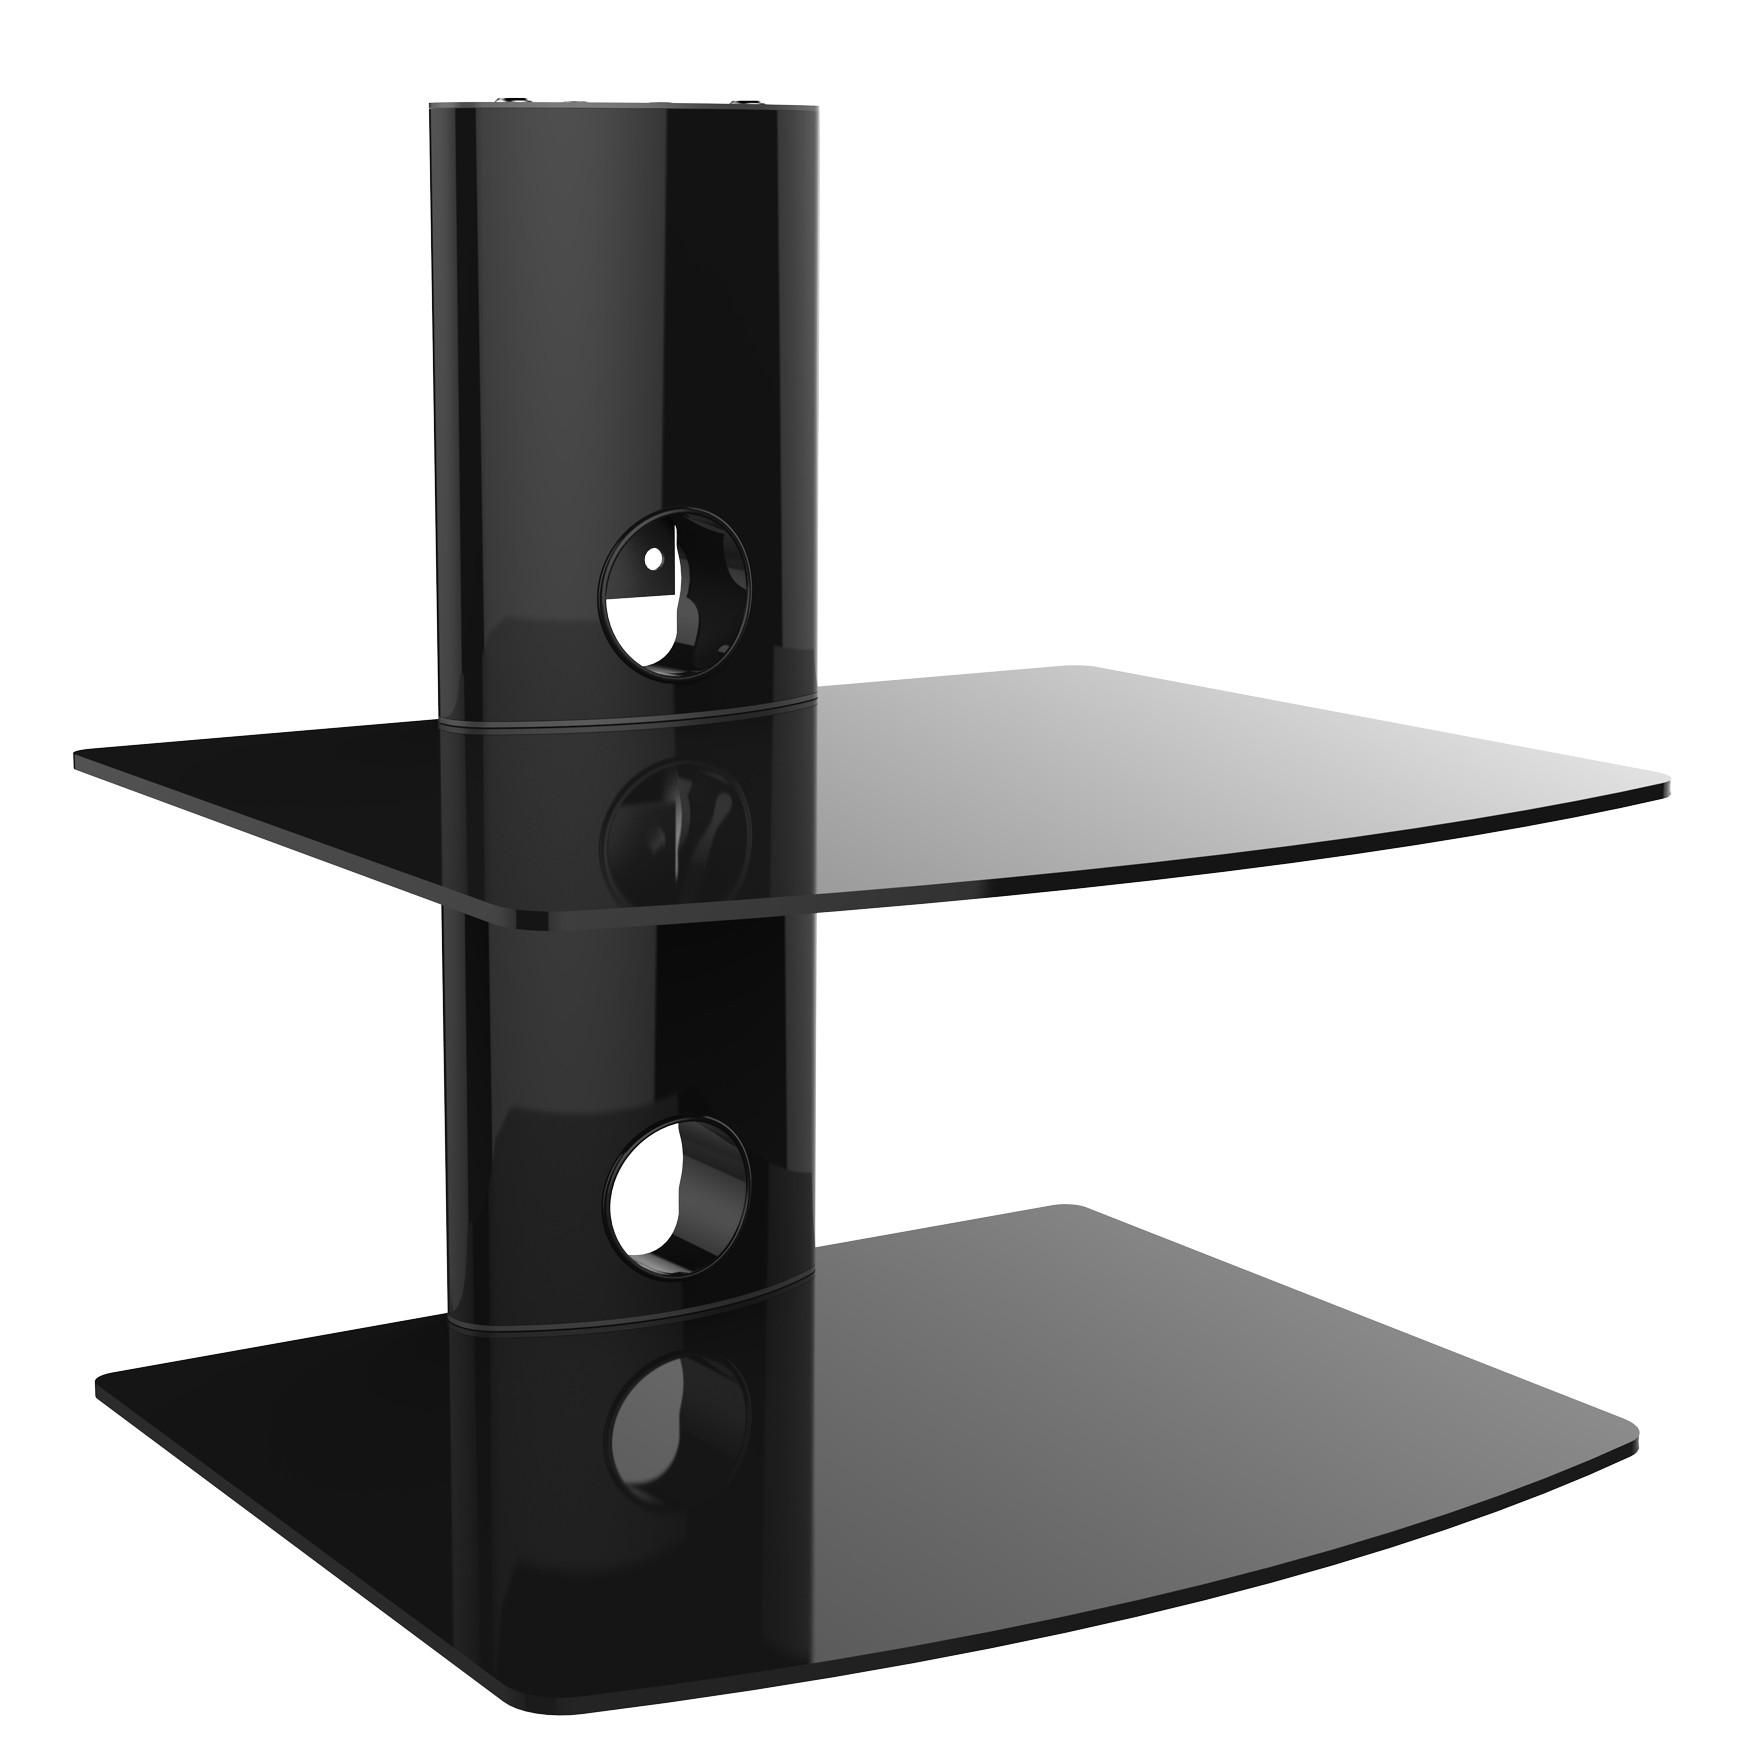 hifi media dvd wandregal wandhalterung konsole regal. Black Bedroom Furniture Sets. Home Design Ideas